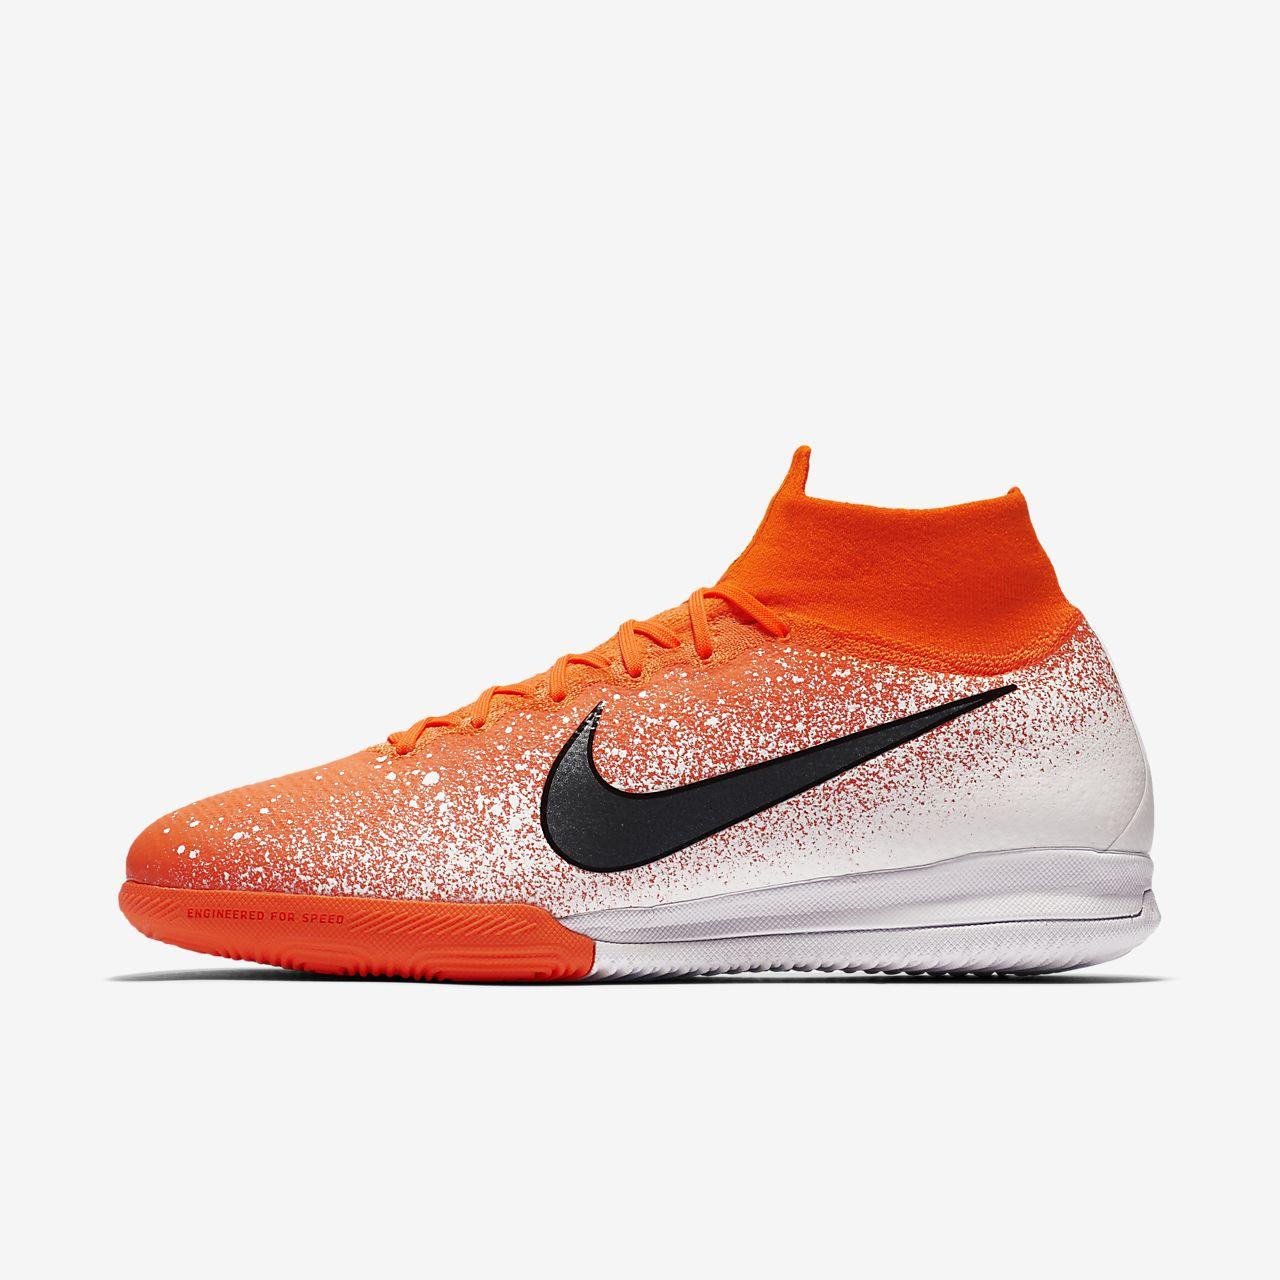 Fotbollssko för inomhusplan/futsal/street Nike SuperflyX 6 Elite IC